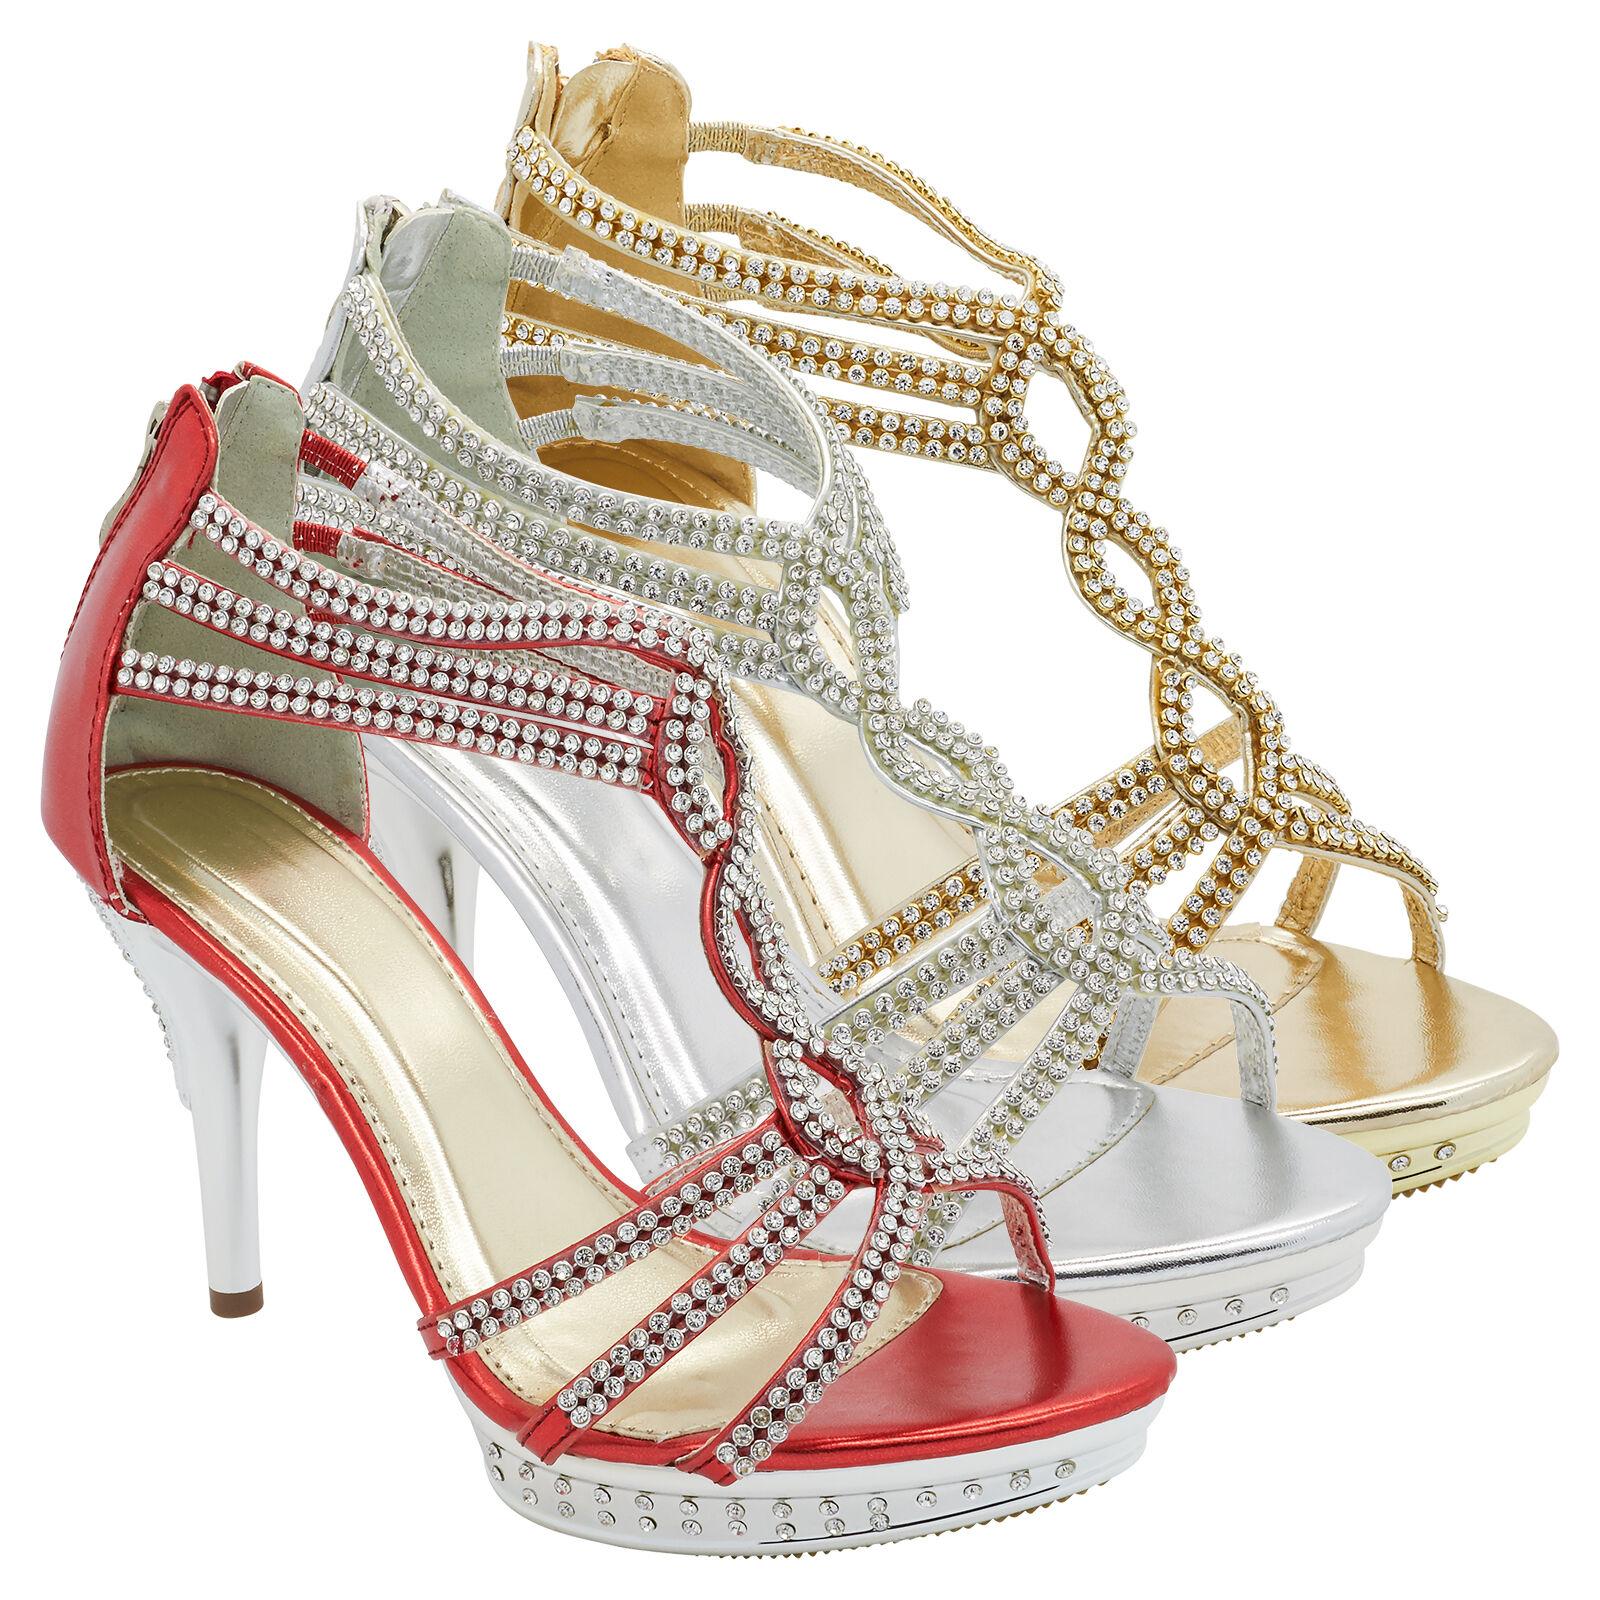 Womens Diamante Platform Shoes High Heel Ankle Strap Sandals Wedding Bridal Size